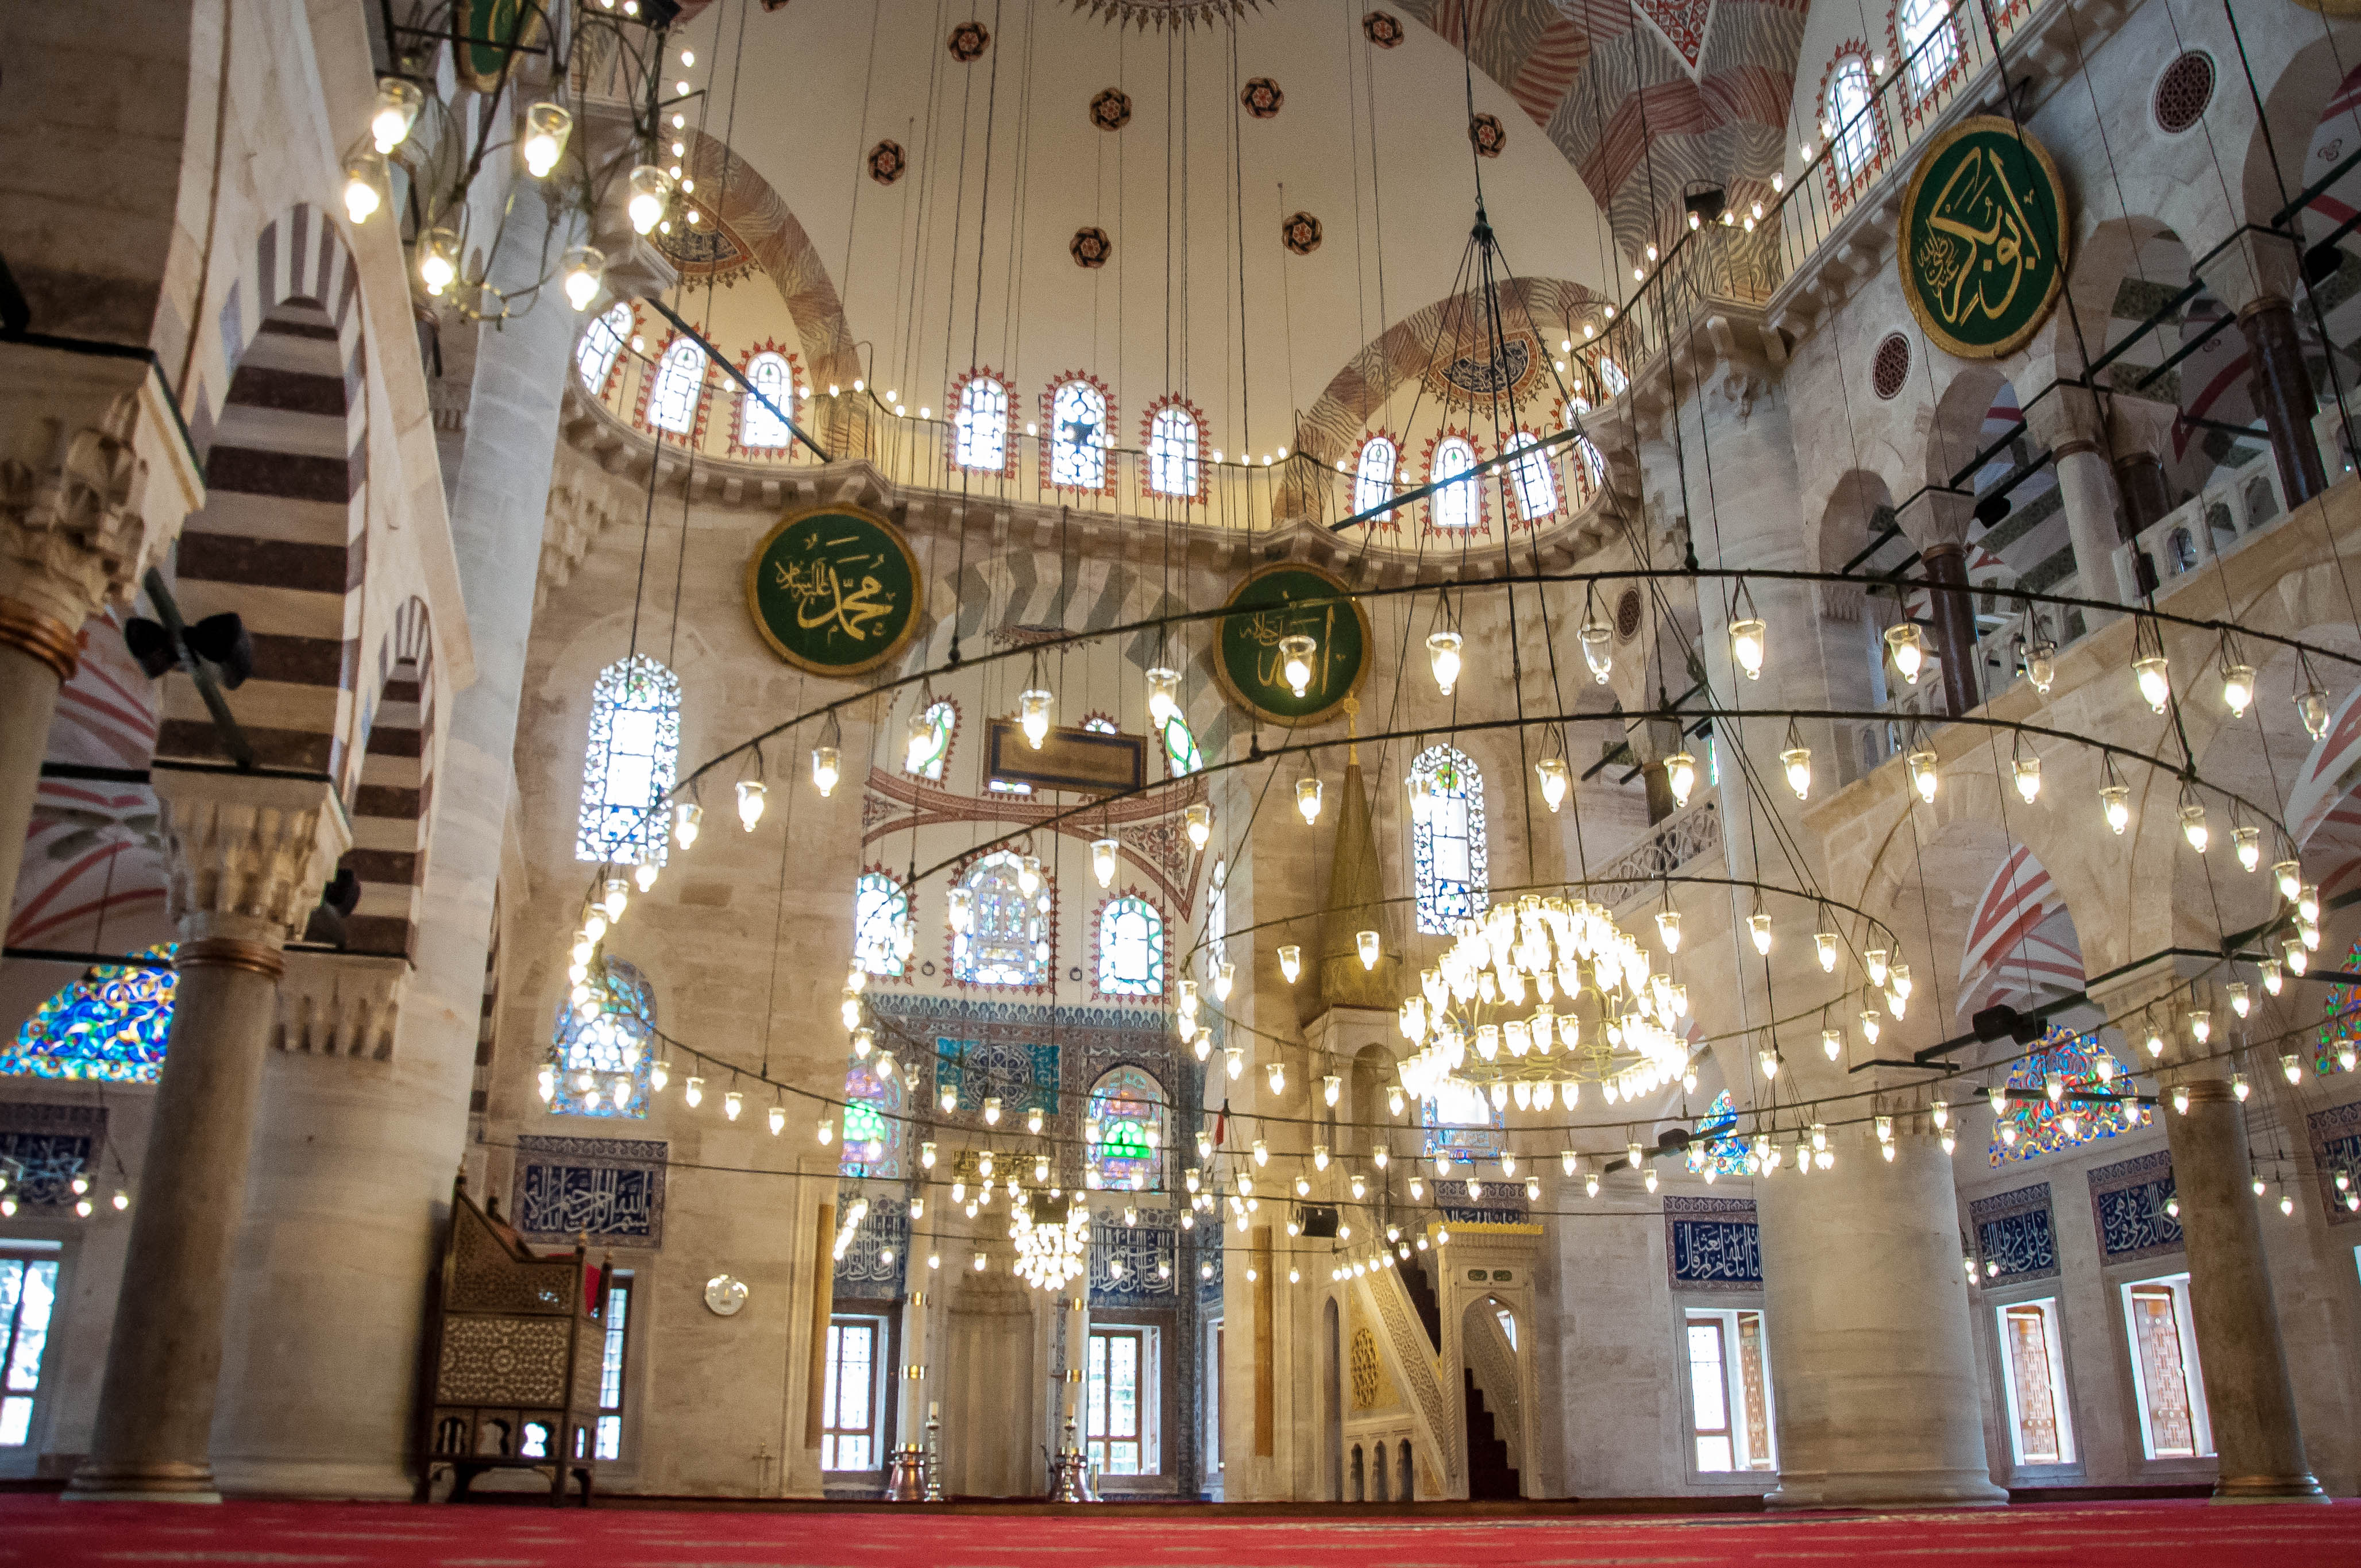 Flickr - Schegge di Istanbul, moschee